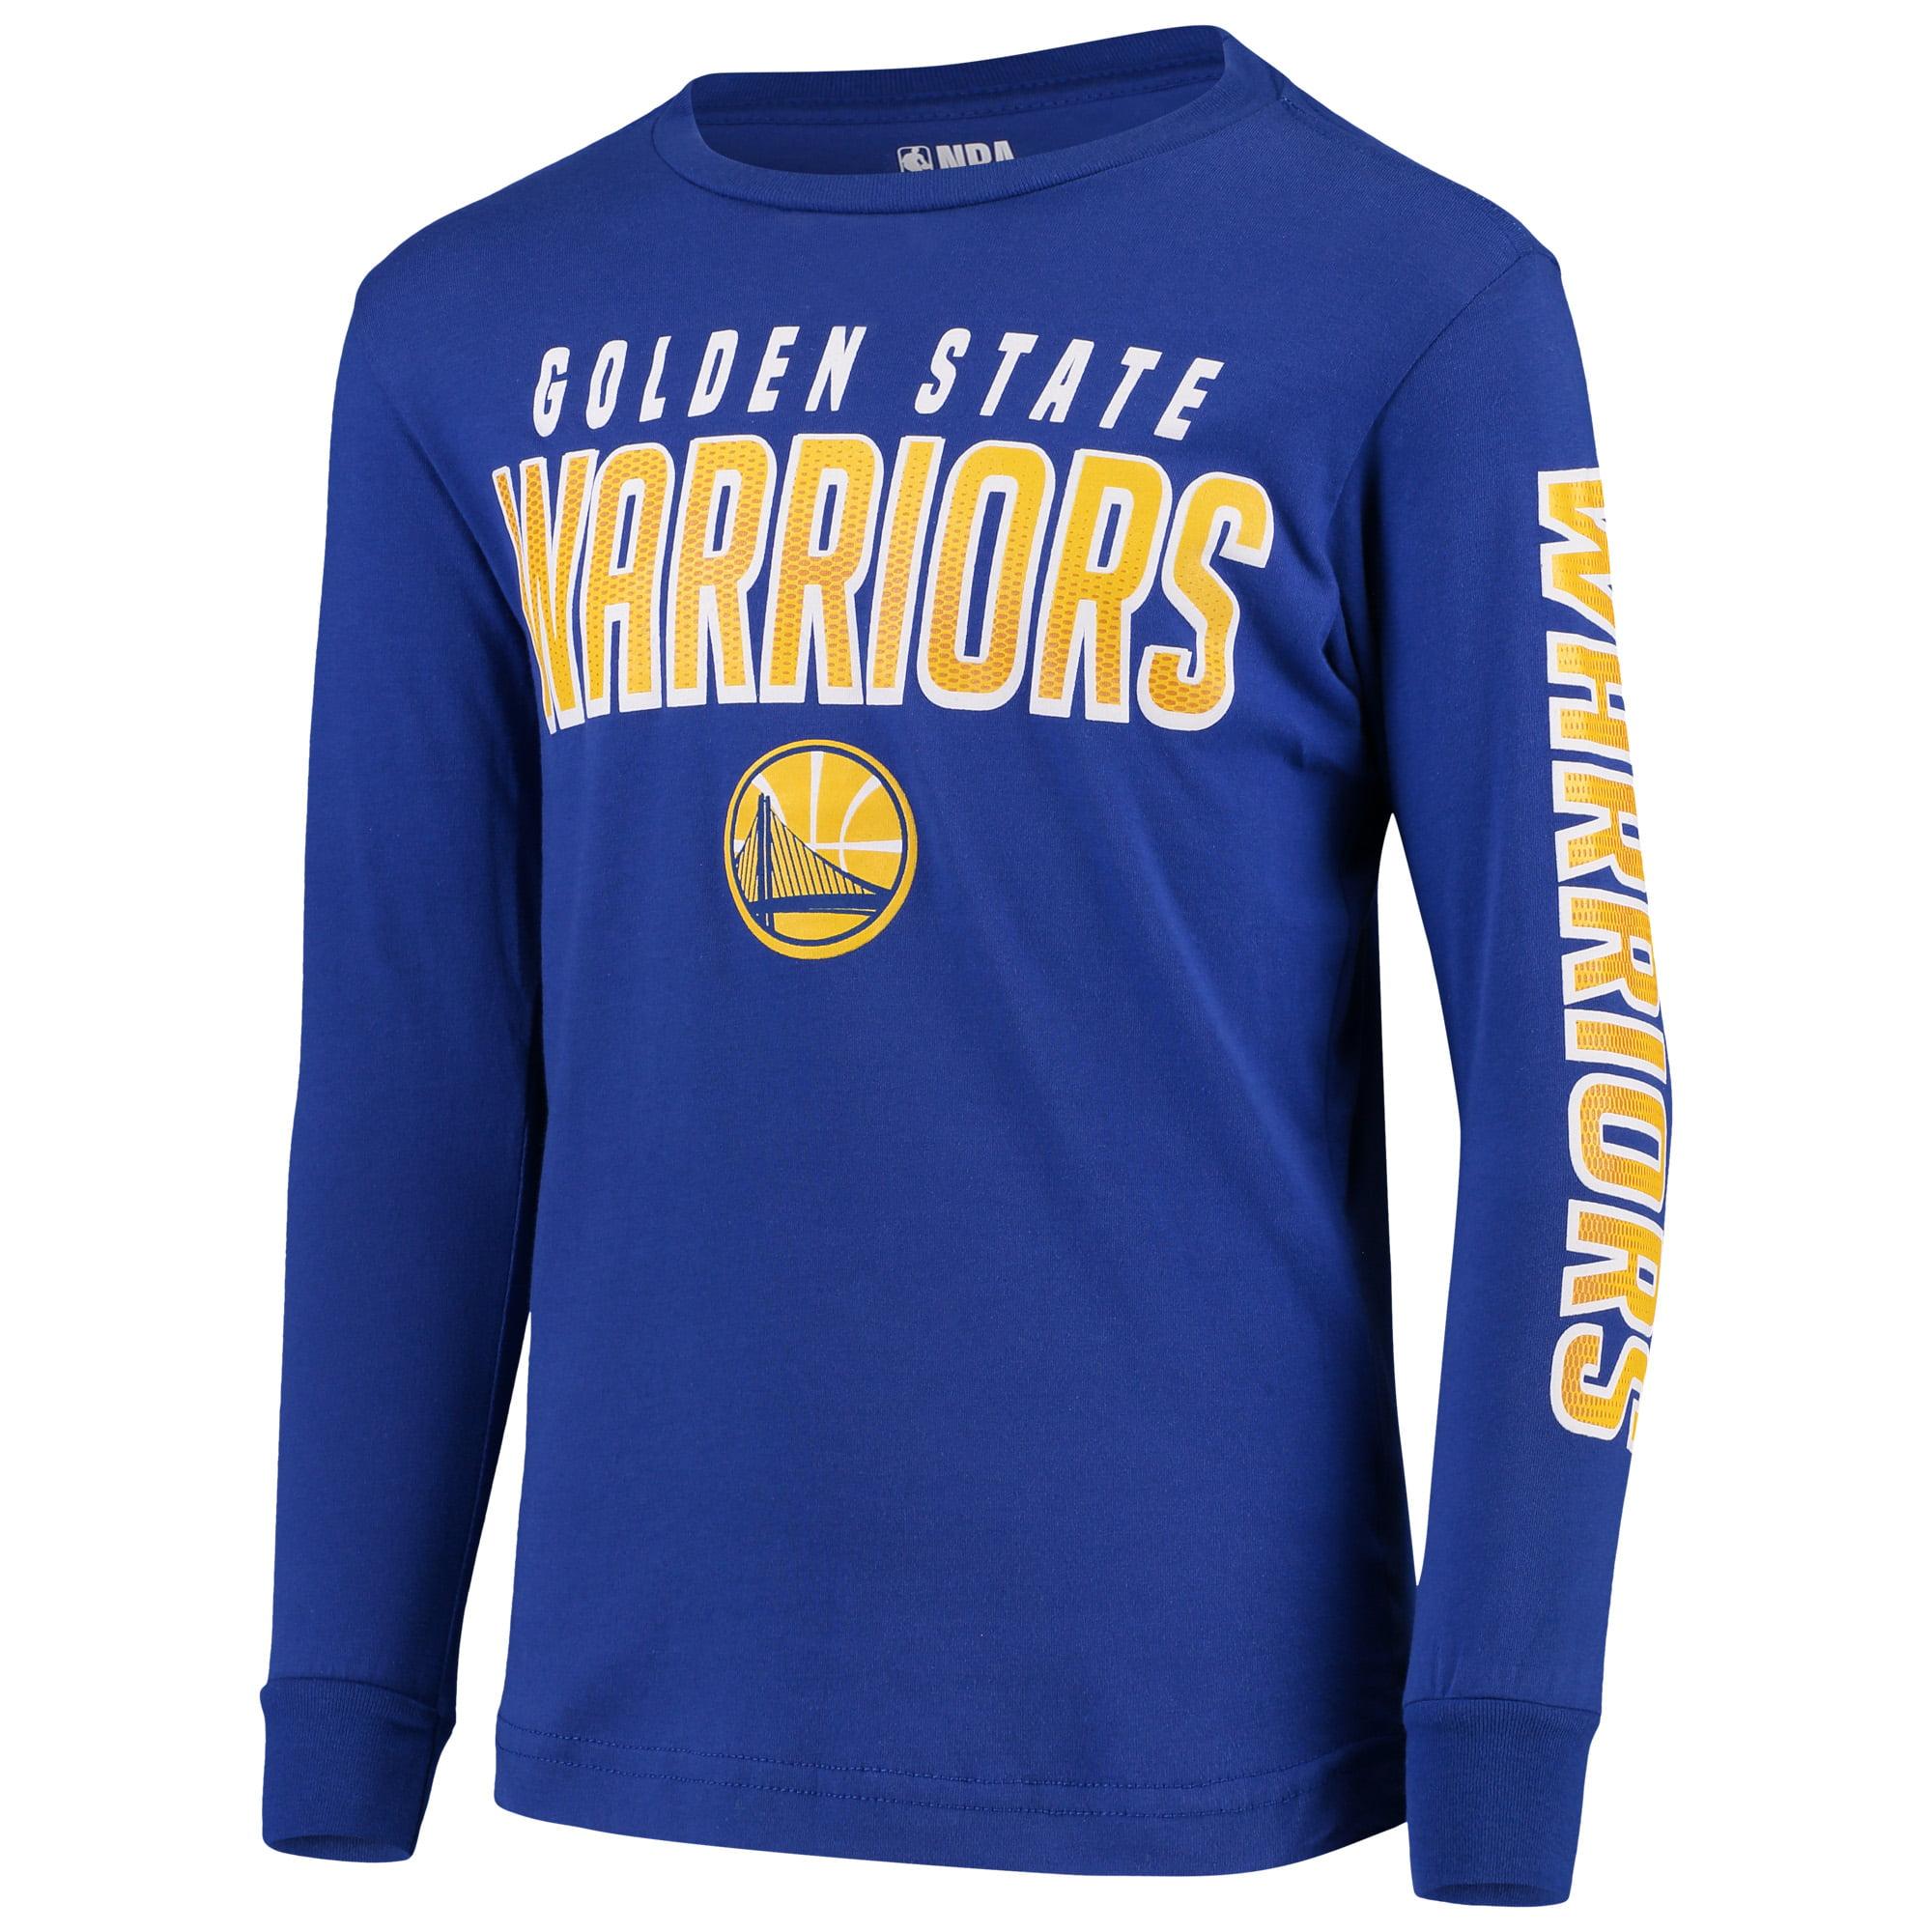 Youth Royal Golden State Warriors Team Wordmark Long Sleeve T-Shirt